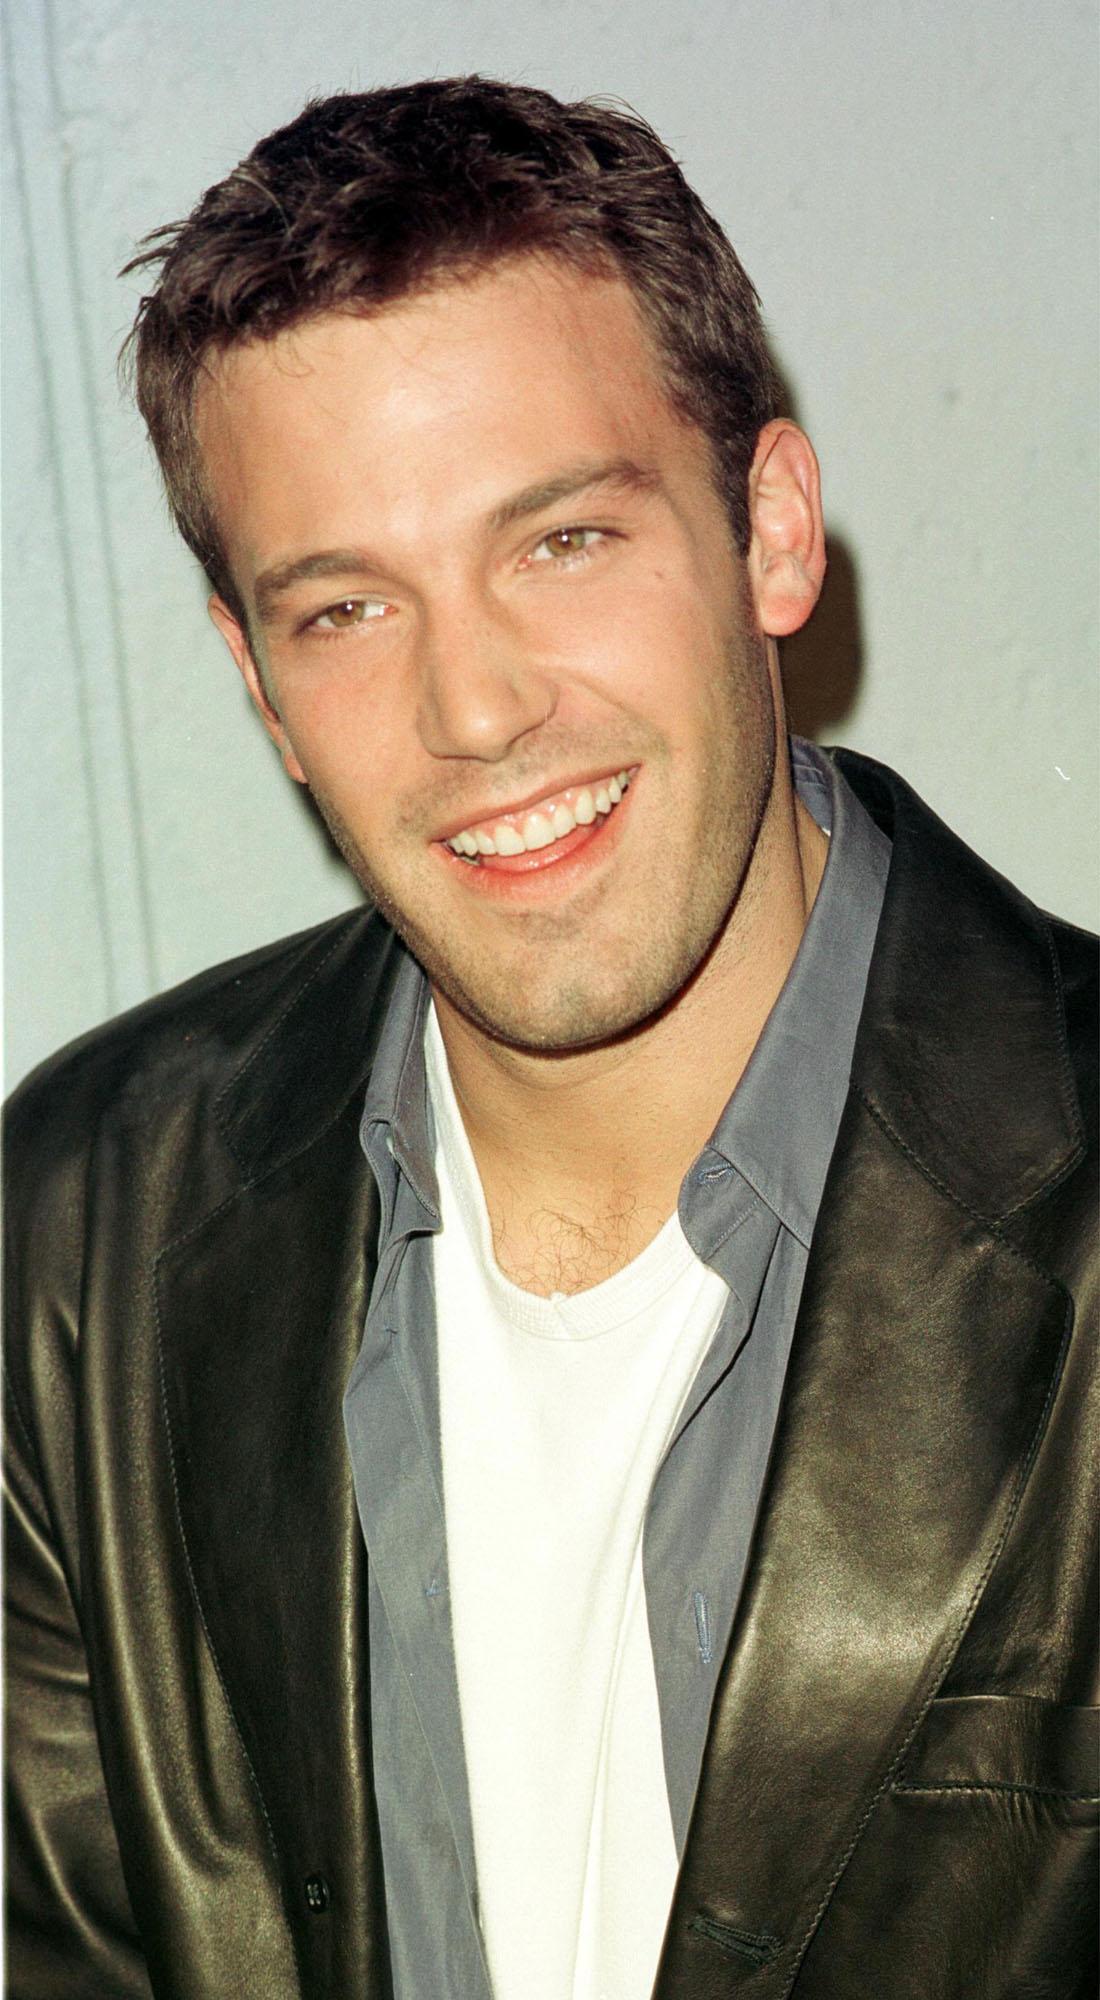 Sexiest Man Alive 2002 - Ben Affleck